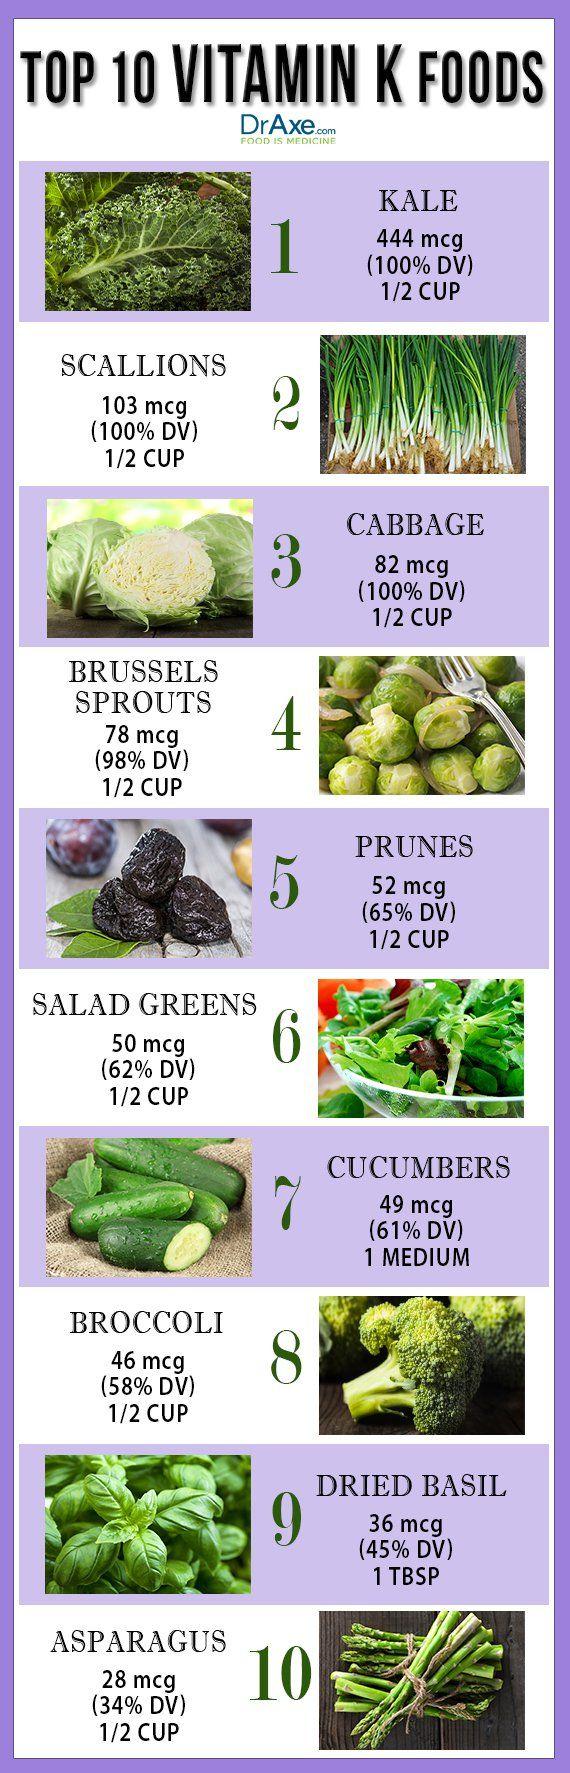 Top 10 Vitamin K Rich Foods - DrAxe.com